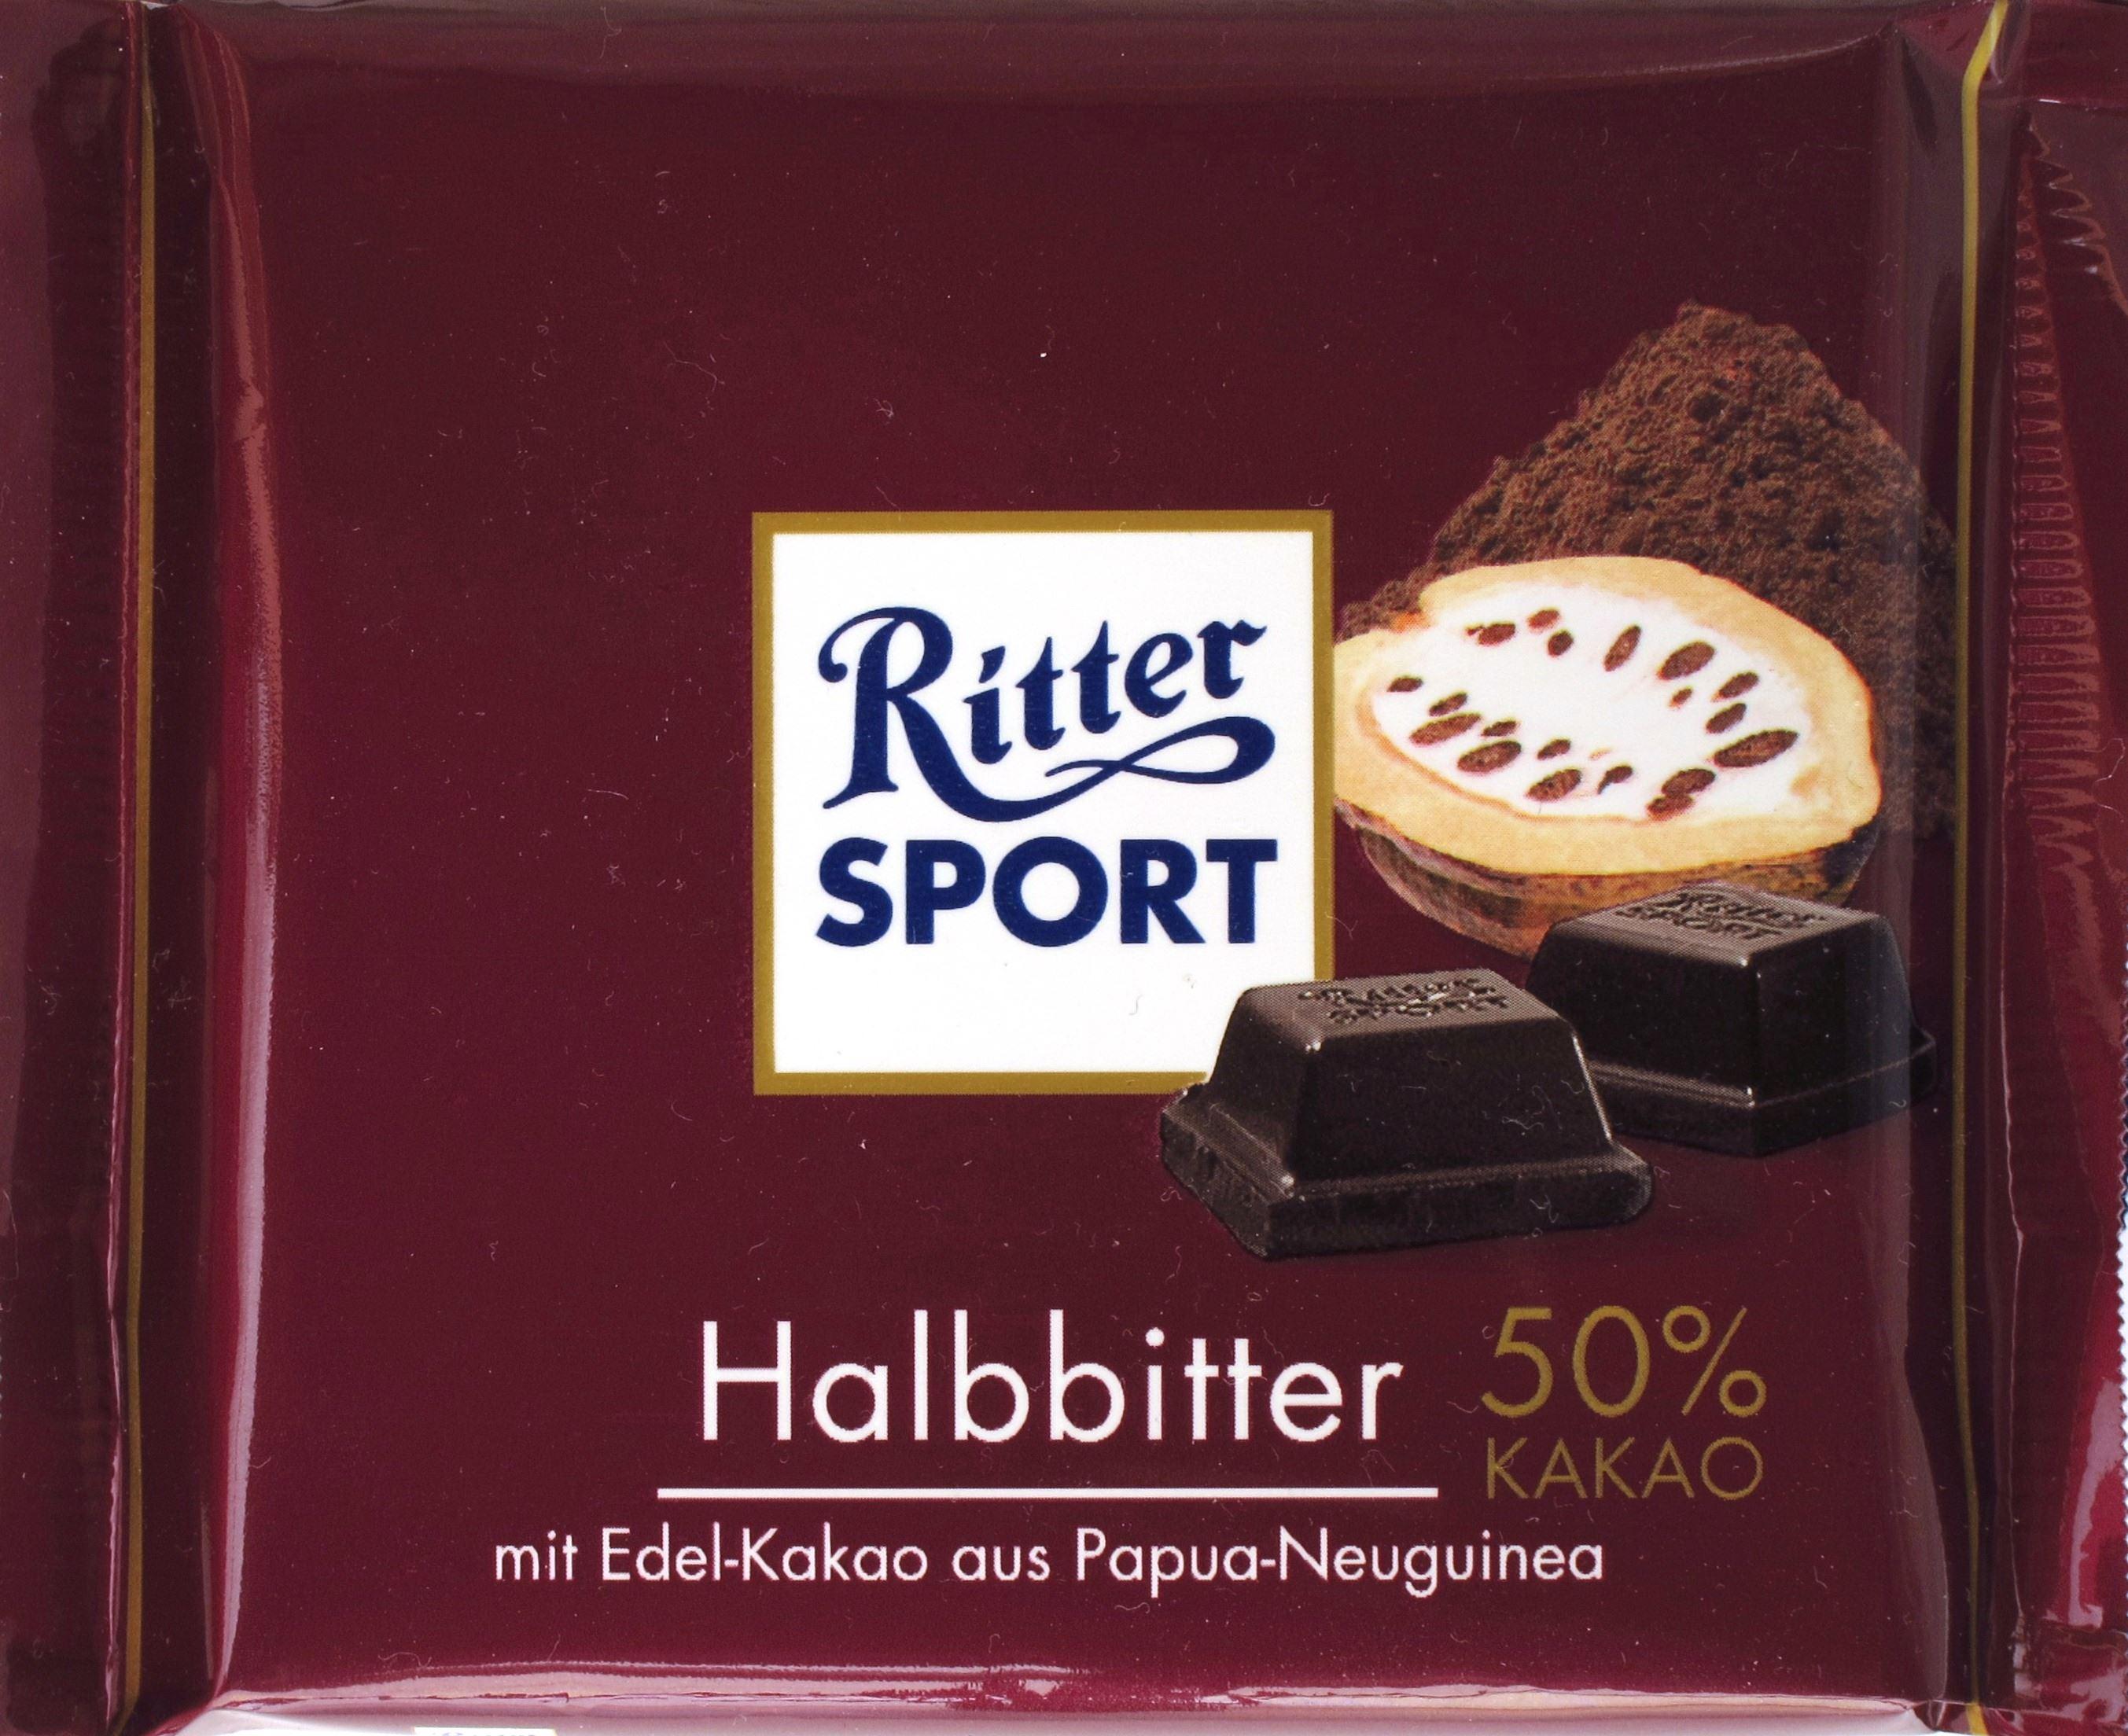 Ritter Sport Halbbitter-Schokolade Packung